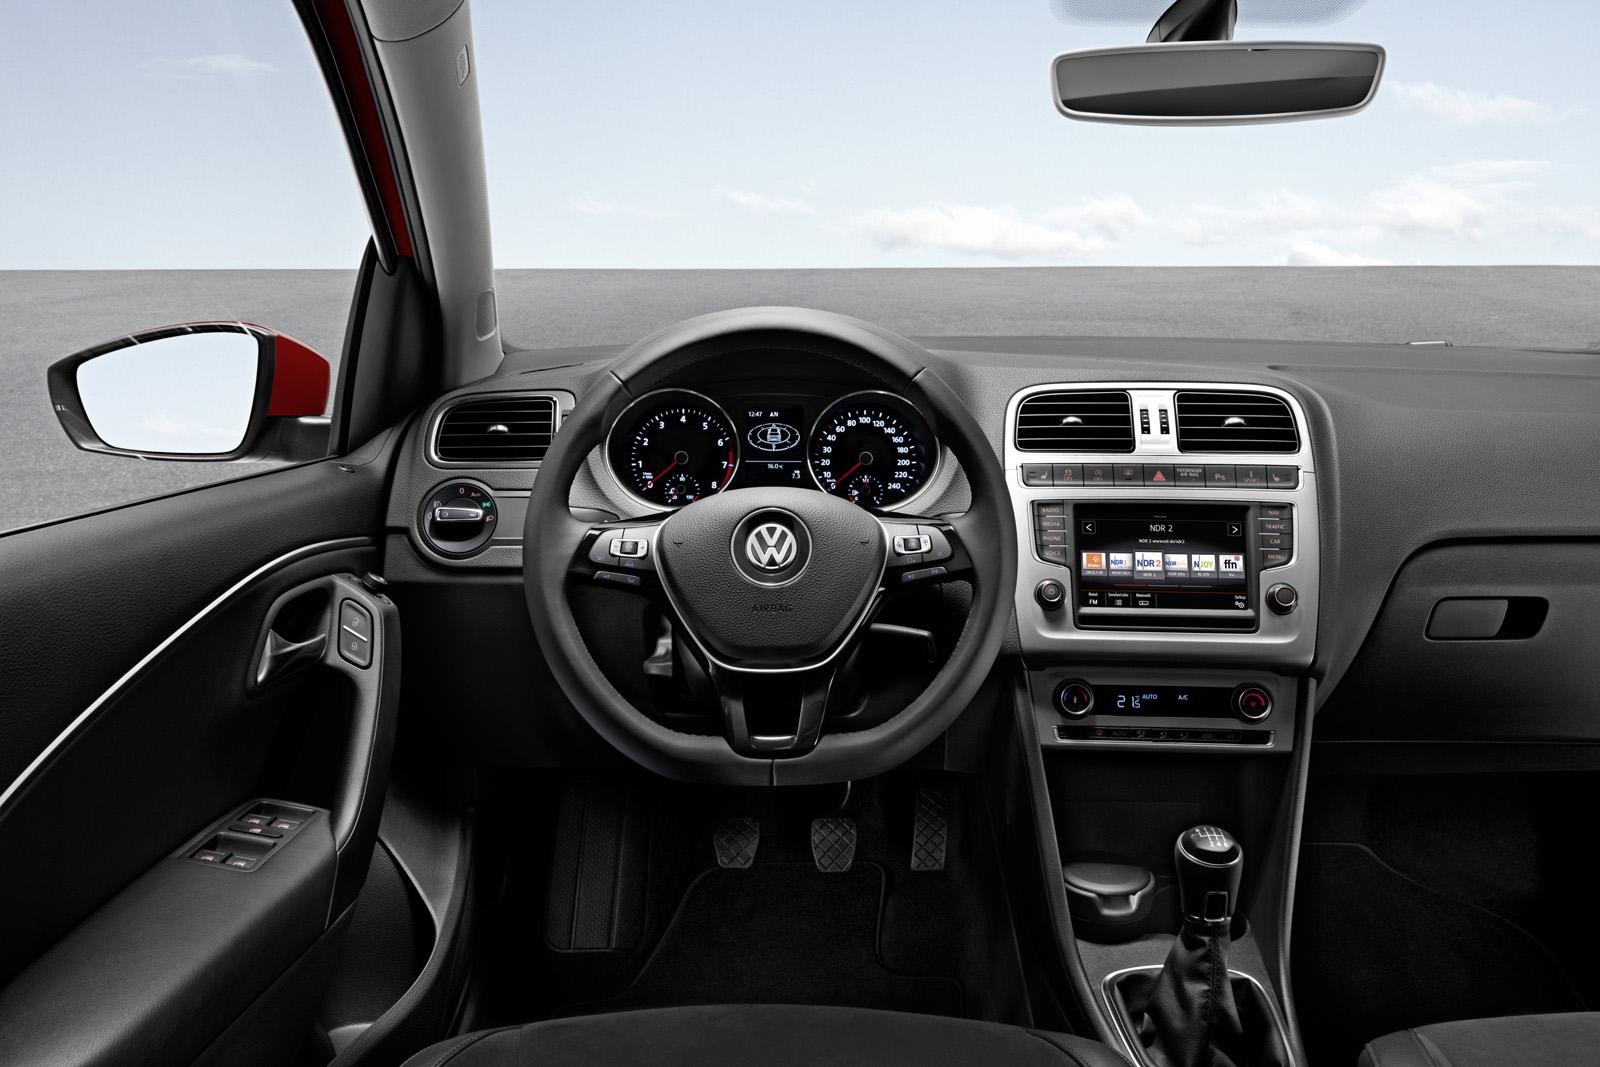 https://www.carsbase.com/photo/Volkswagen-Polo_mp53_pic_107216.jpg